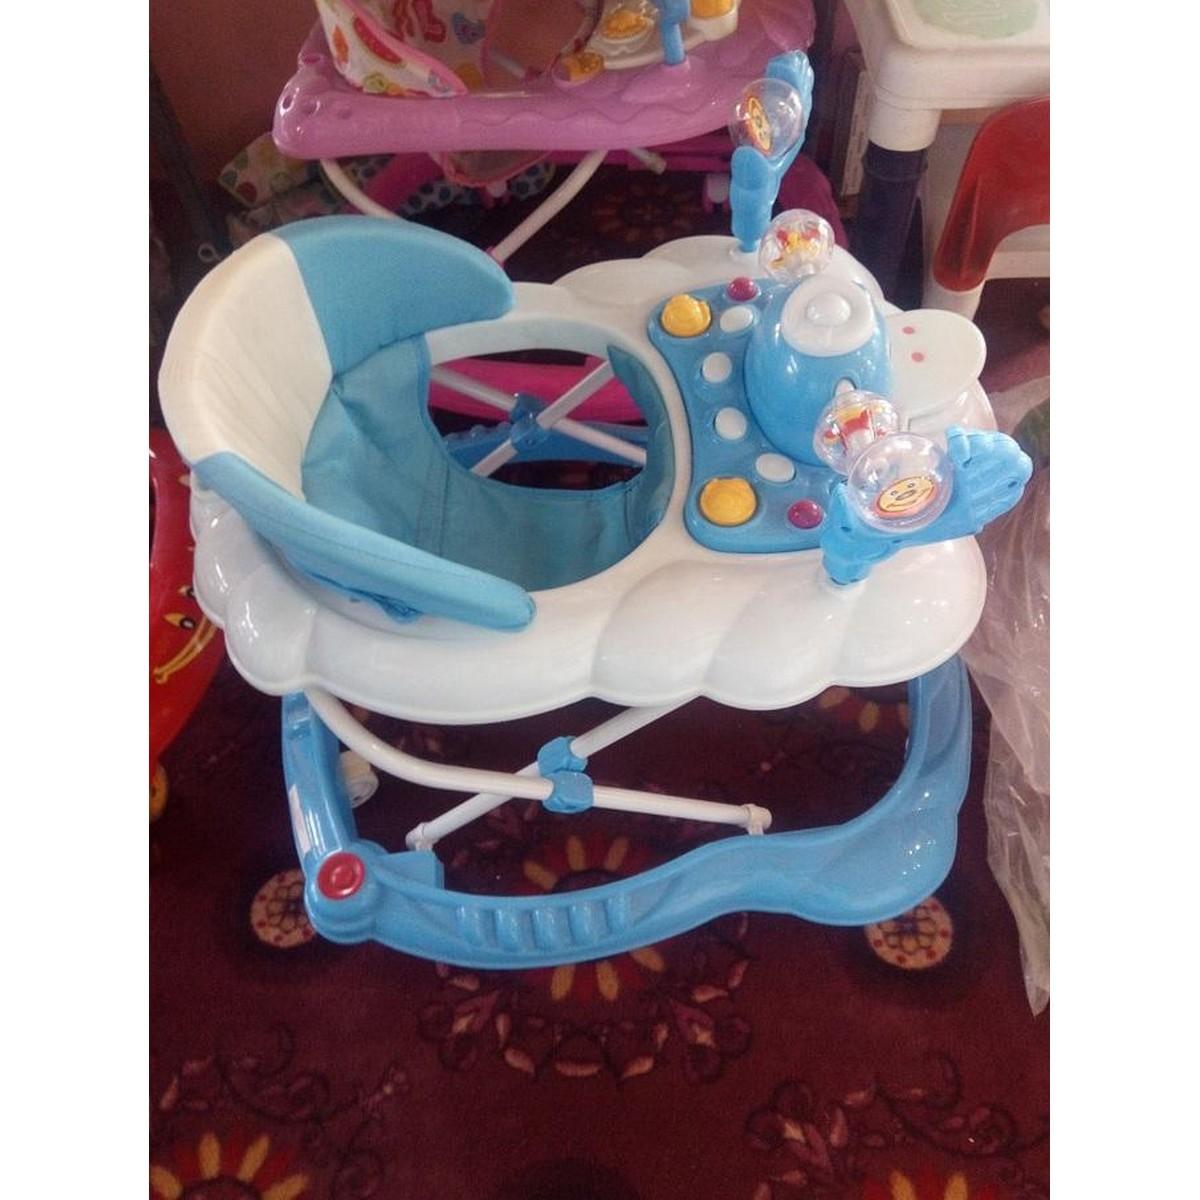 Baby Walker Udhari With Music & Light premium quality plastic